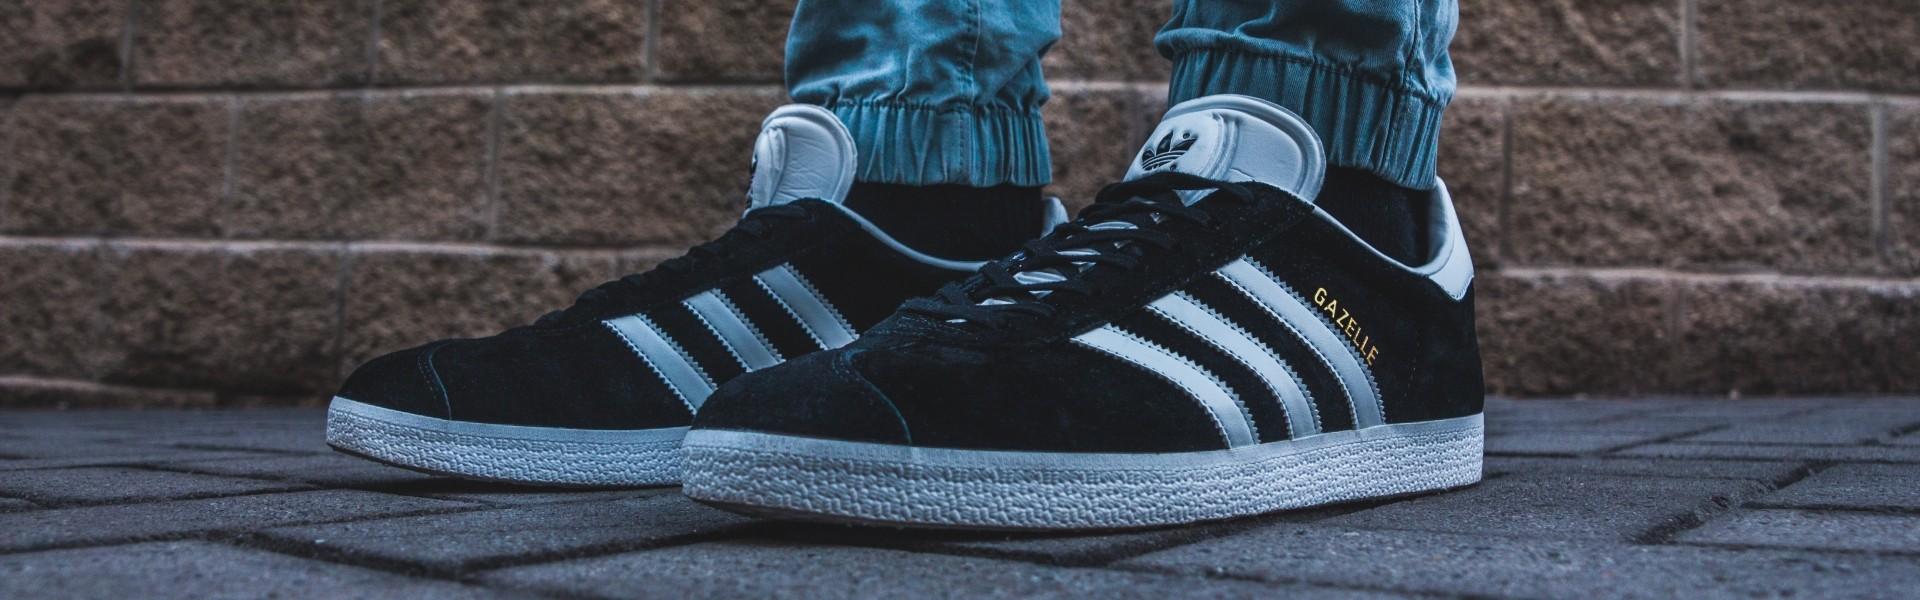 1e6019ee174 Adidas wint strepenzaak | NLO